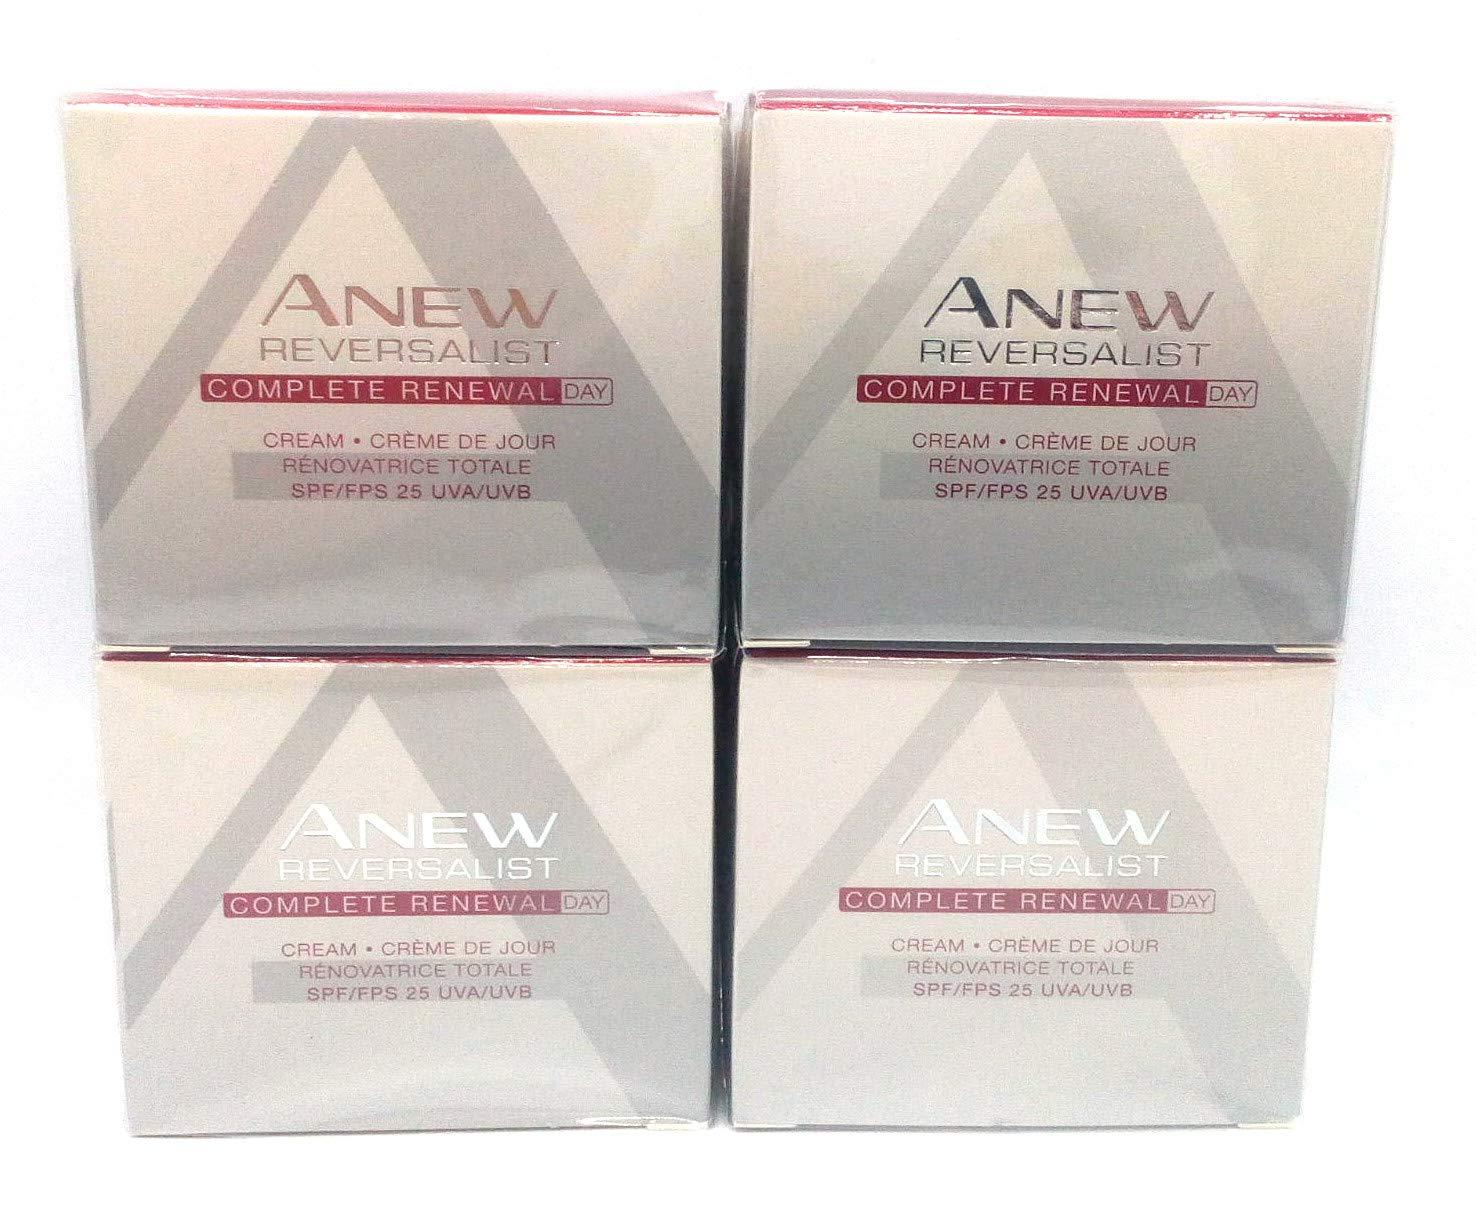 4 x AVON Anew Reversalist Complete Renewal Day Cream 50ml - 1.7oz SET !